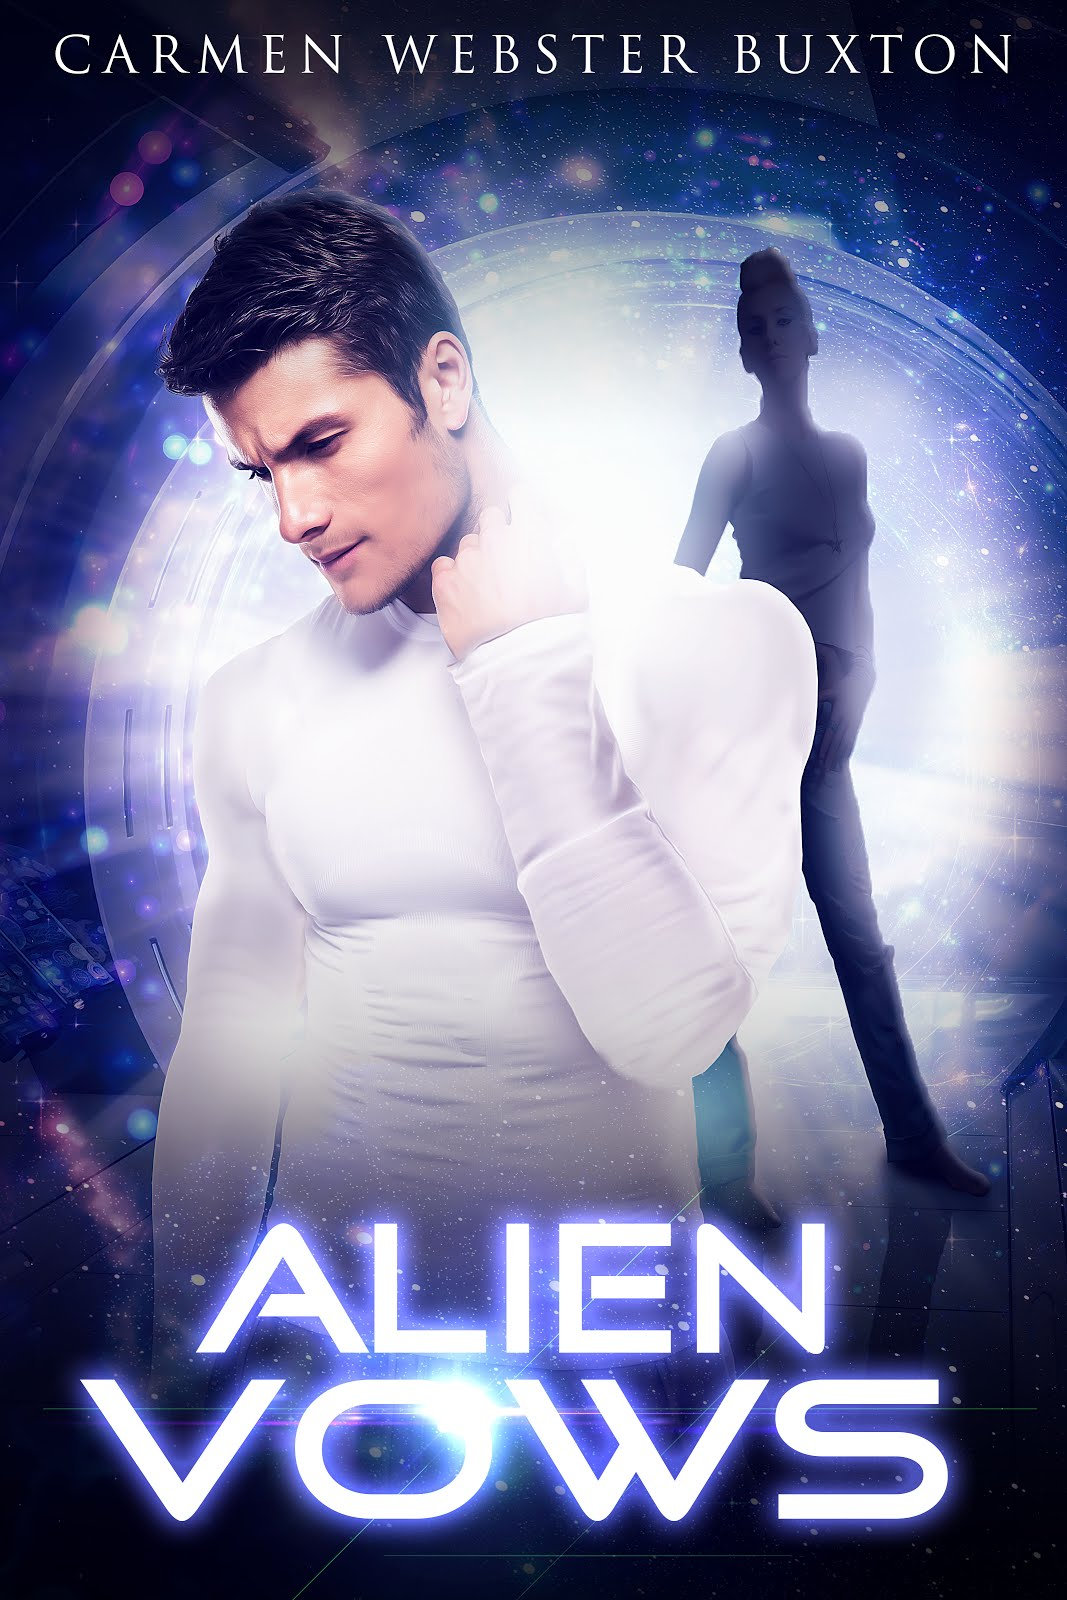 Alien Vows